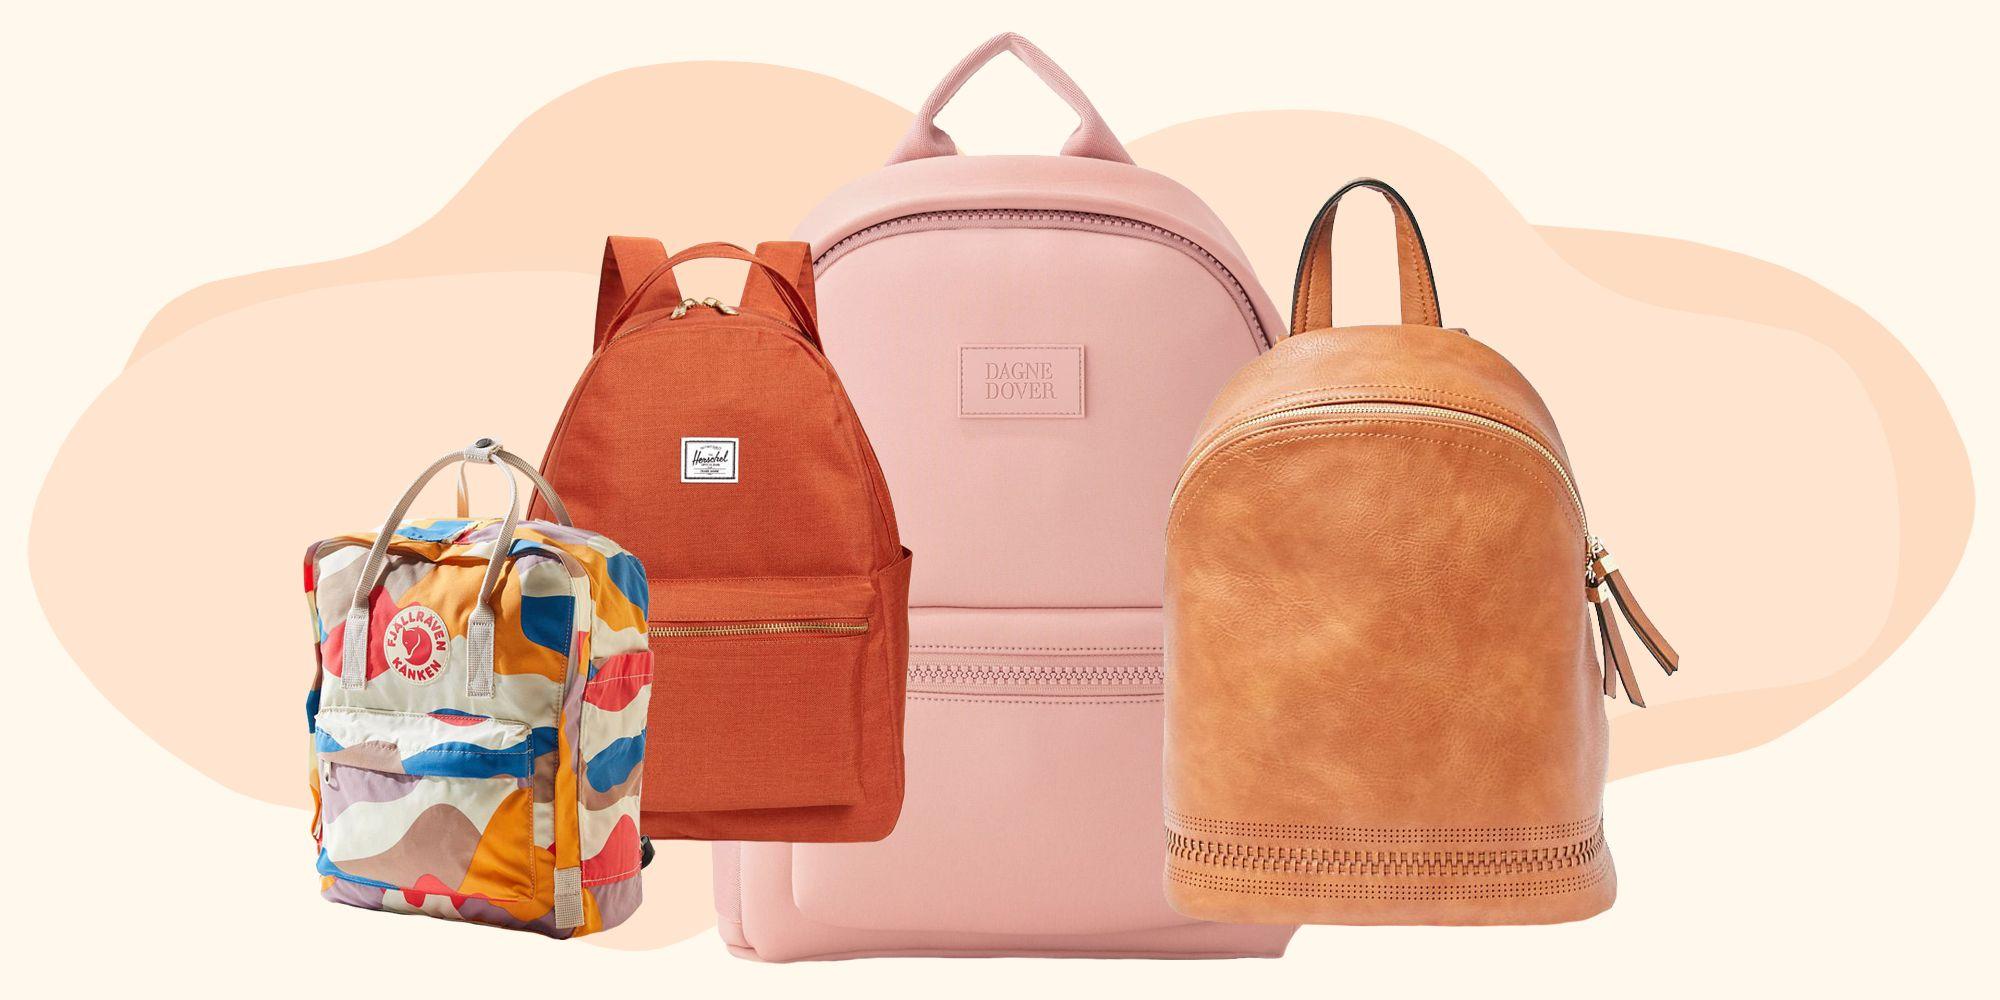 best commuter backpack 2020 23 of the Best Commuter Backpacks — Cute Travel Backpacks 2019